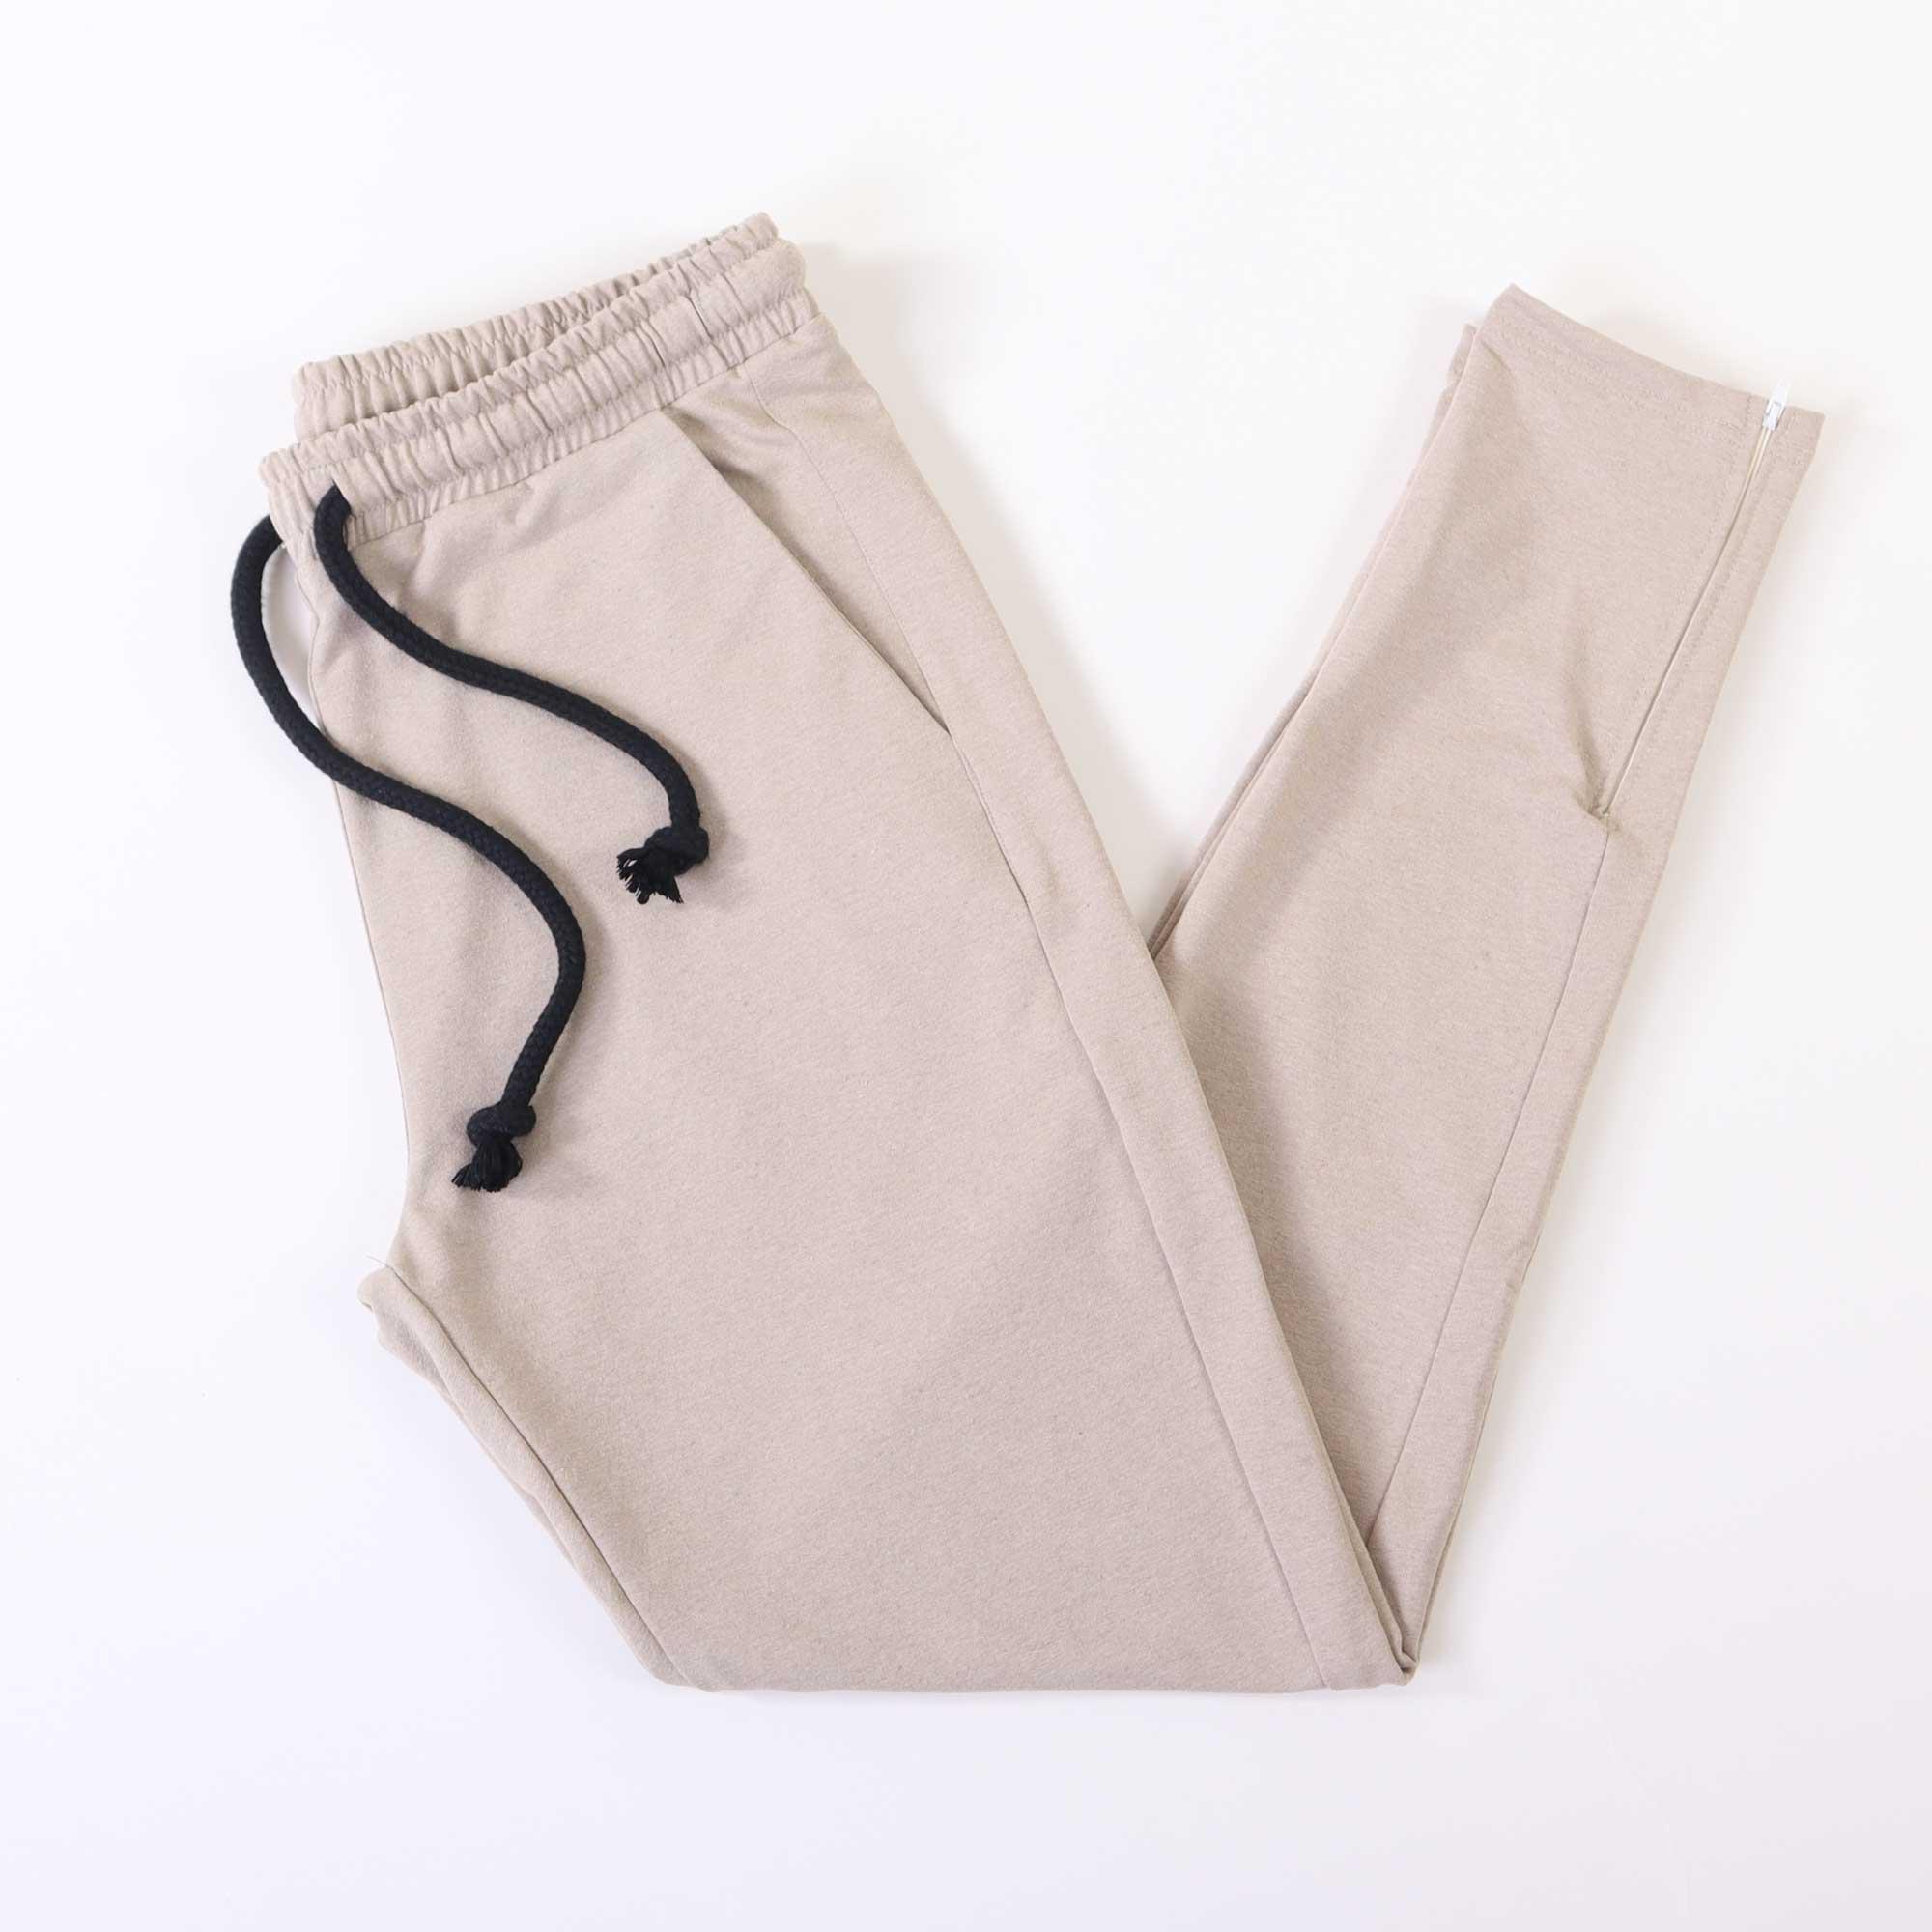 pants-zand-4